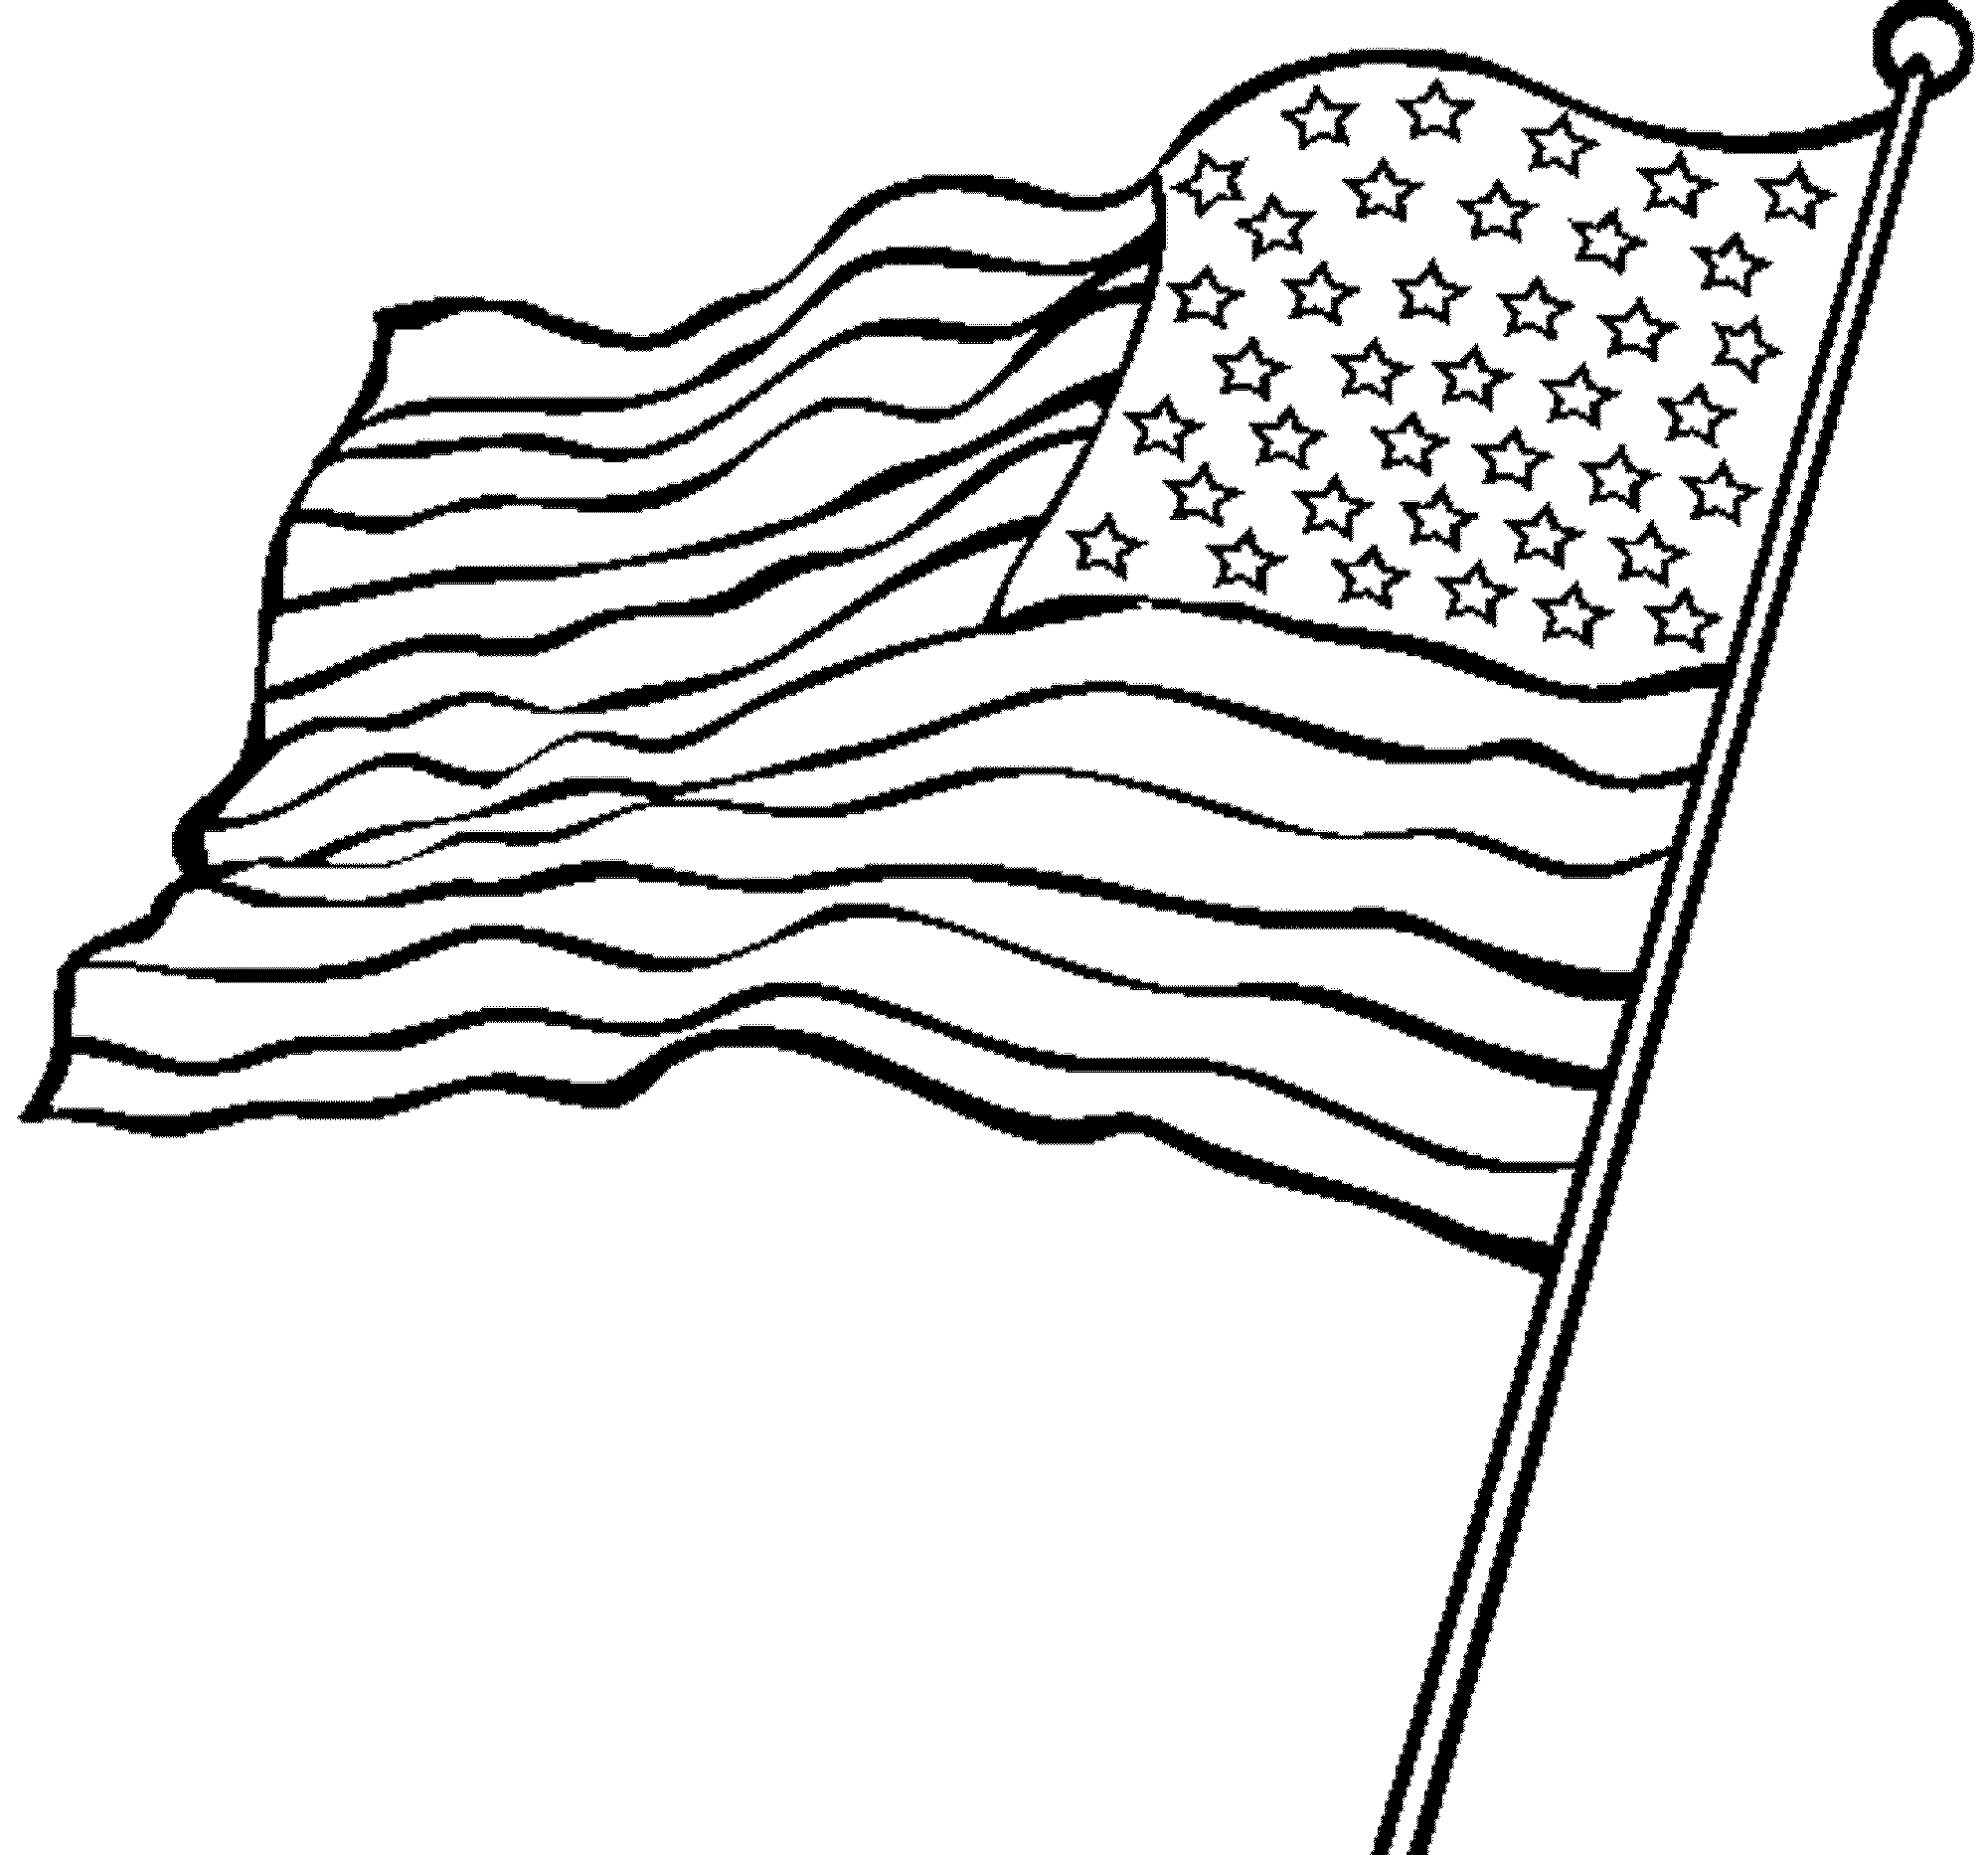 Original American Flag Coloring Page